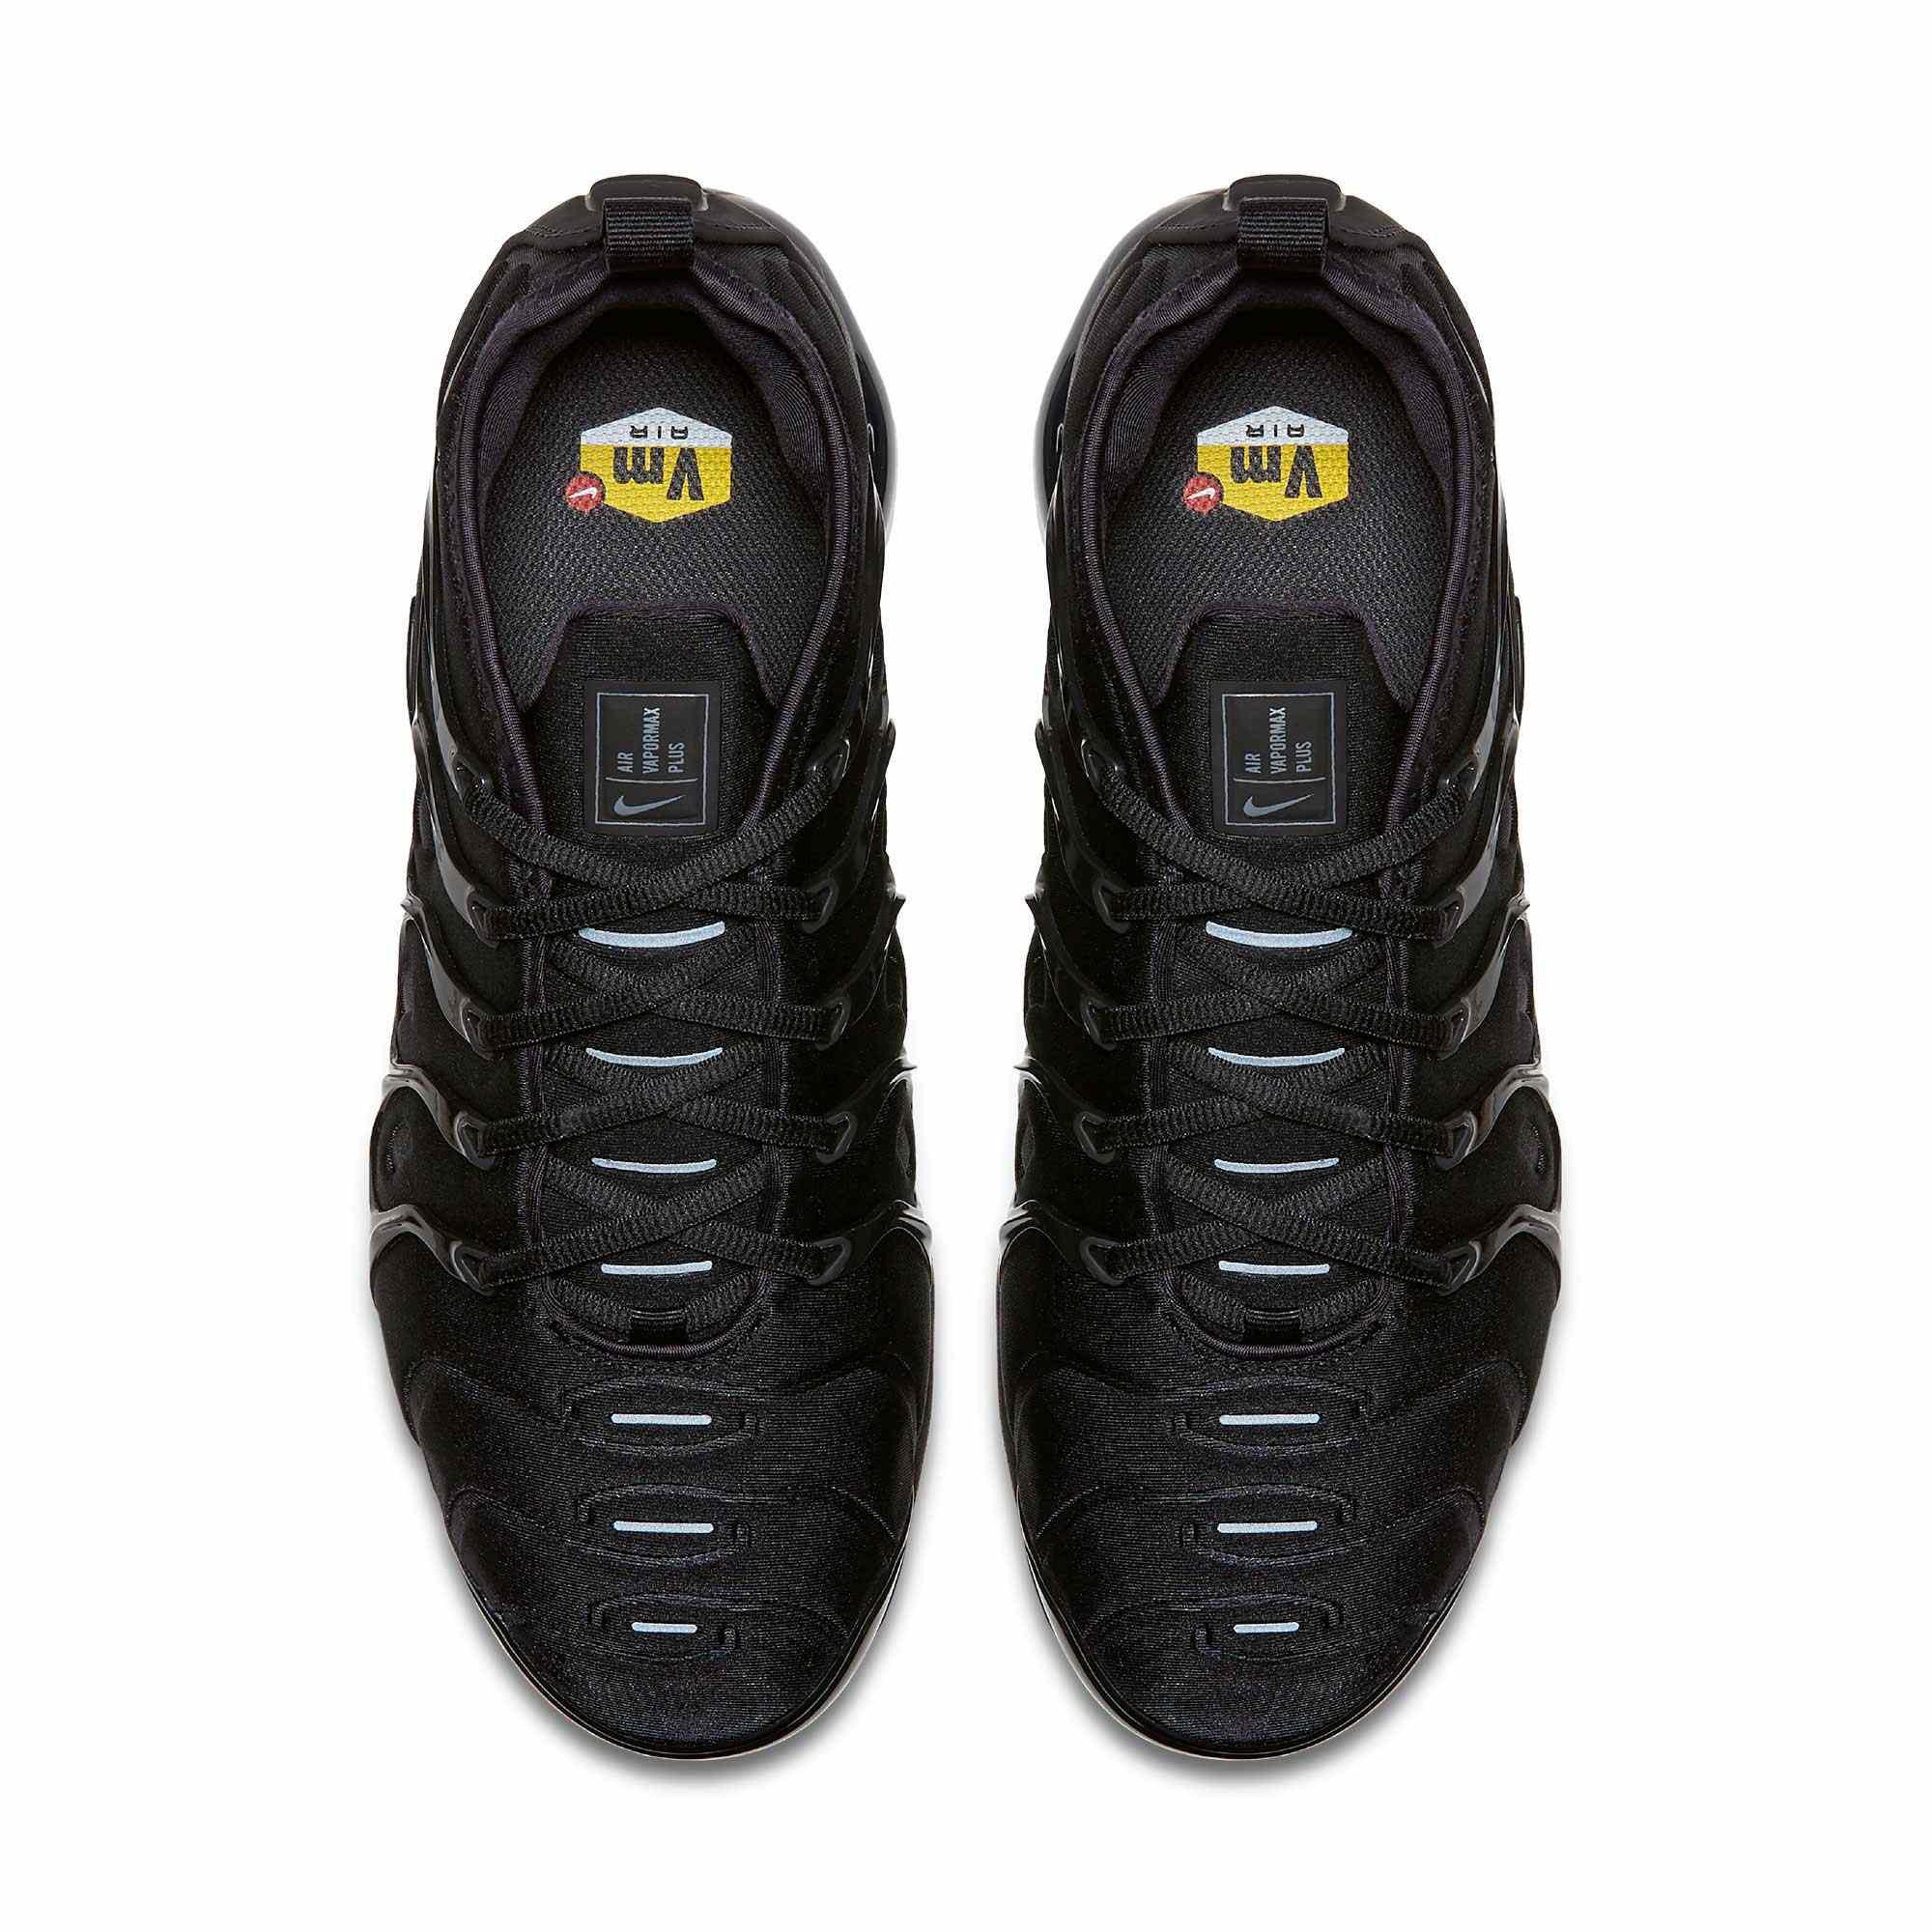 hot sale online b9ad2 d72ea Original New Arrival Authentic NIKE AIR VAPORMAX PLUS Mens Running Shoes  Sneakers 924453 Outdoor Walking jogging